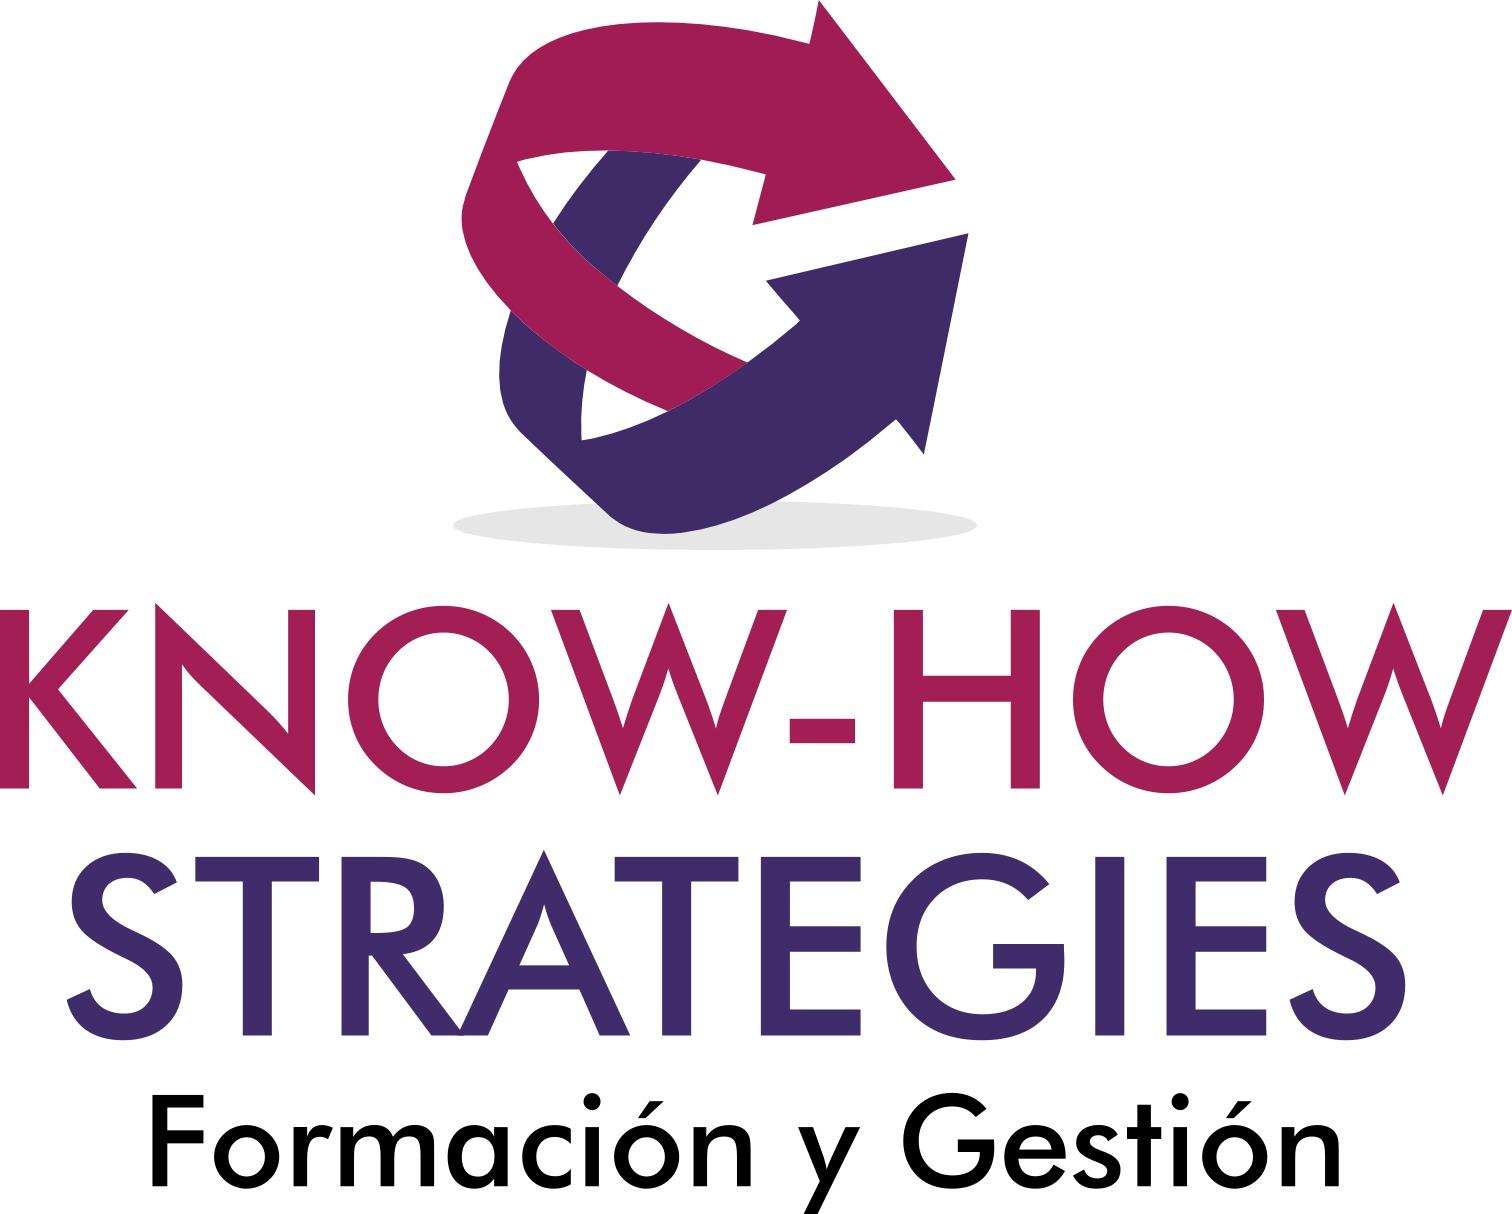 KNOW-HOW STRATEGIES FORMACION Y GESTION  MADRID